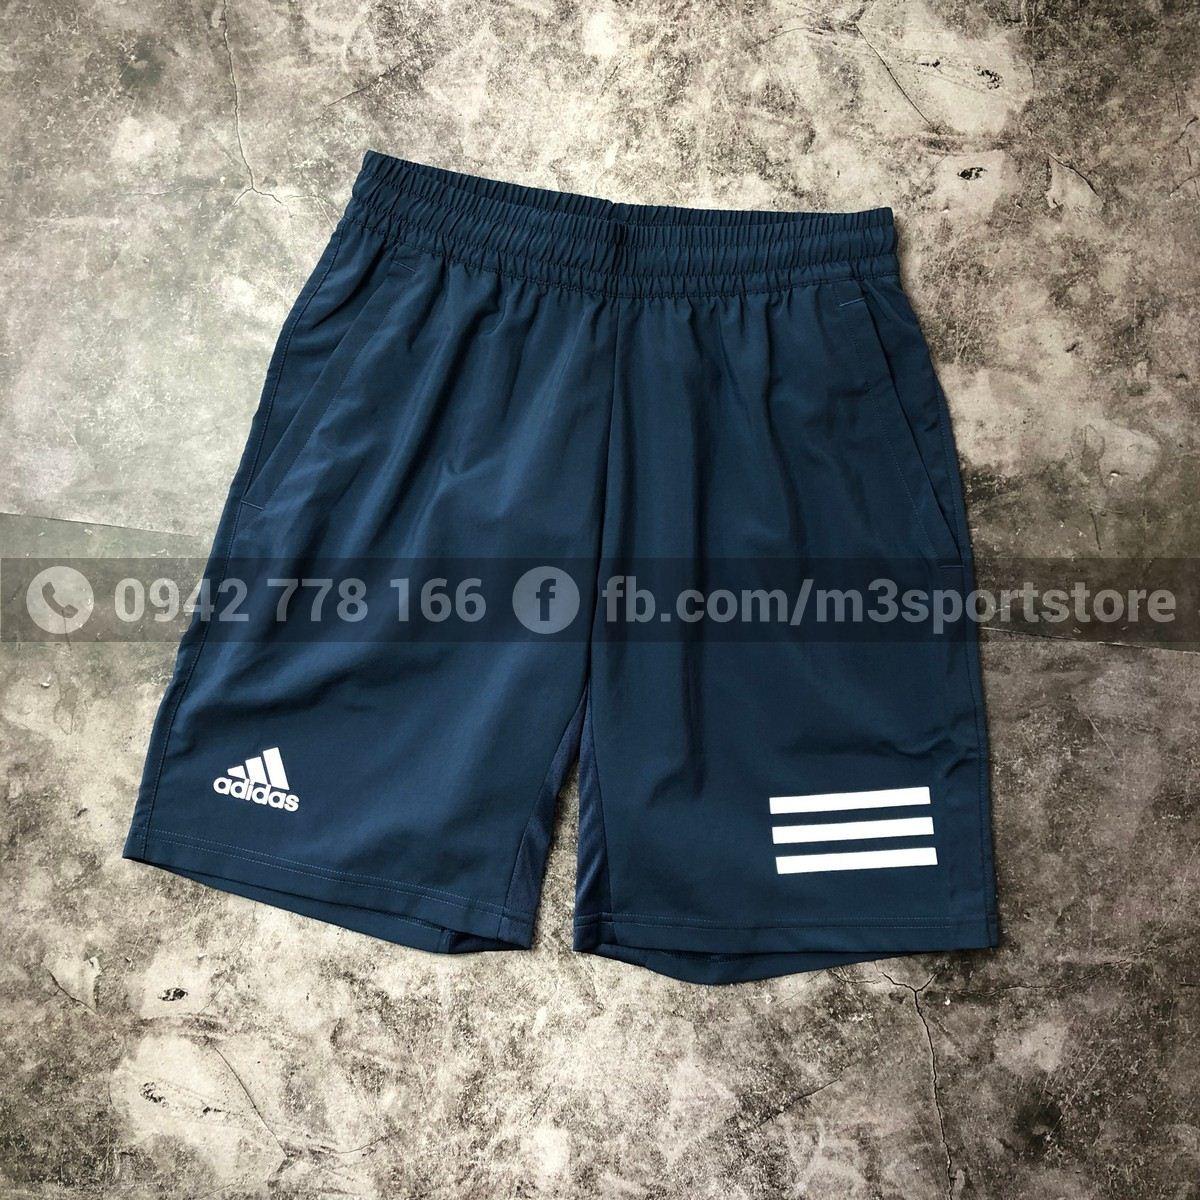 Quần short thể thao nam Adidas Club 3 Stripe GH7225